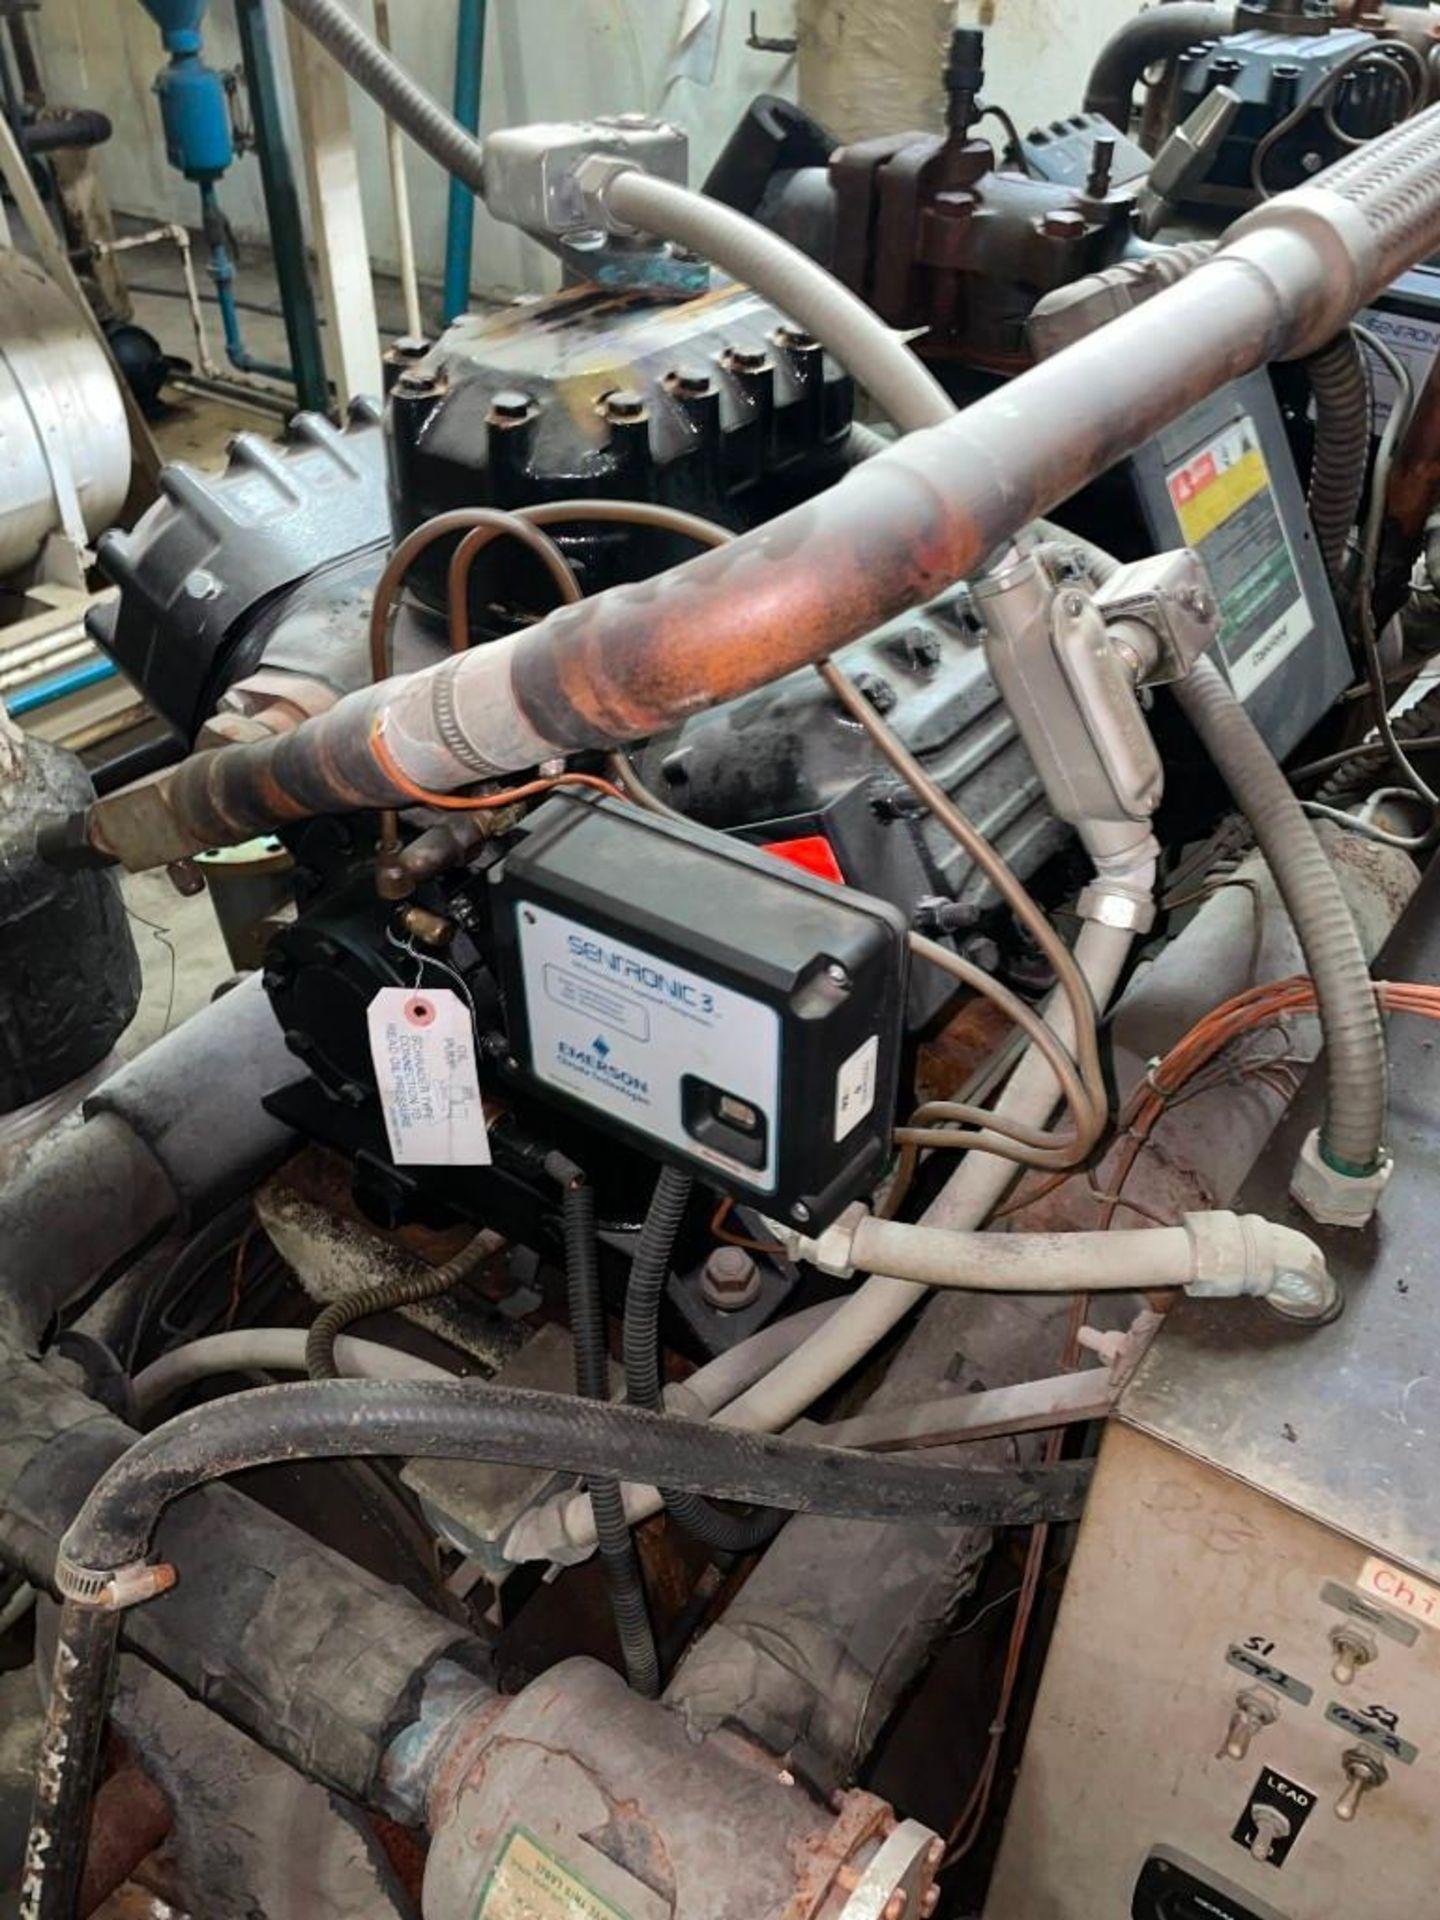 Copeland Copelametic Compressor for Chiller System - Image 8 of 12